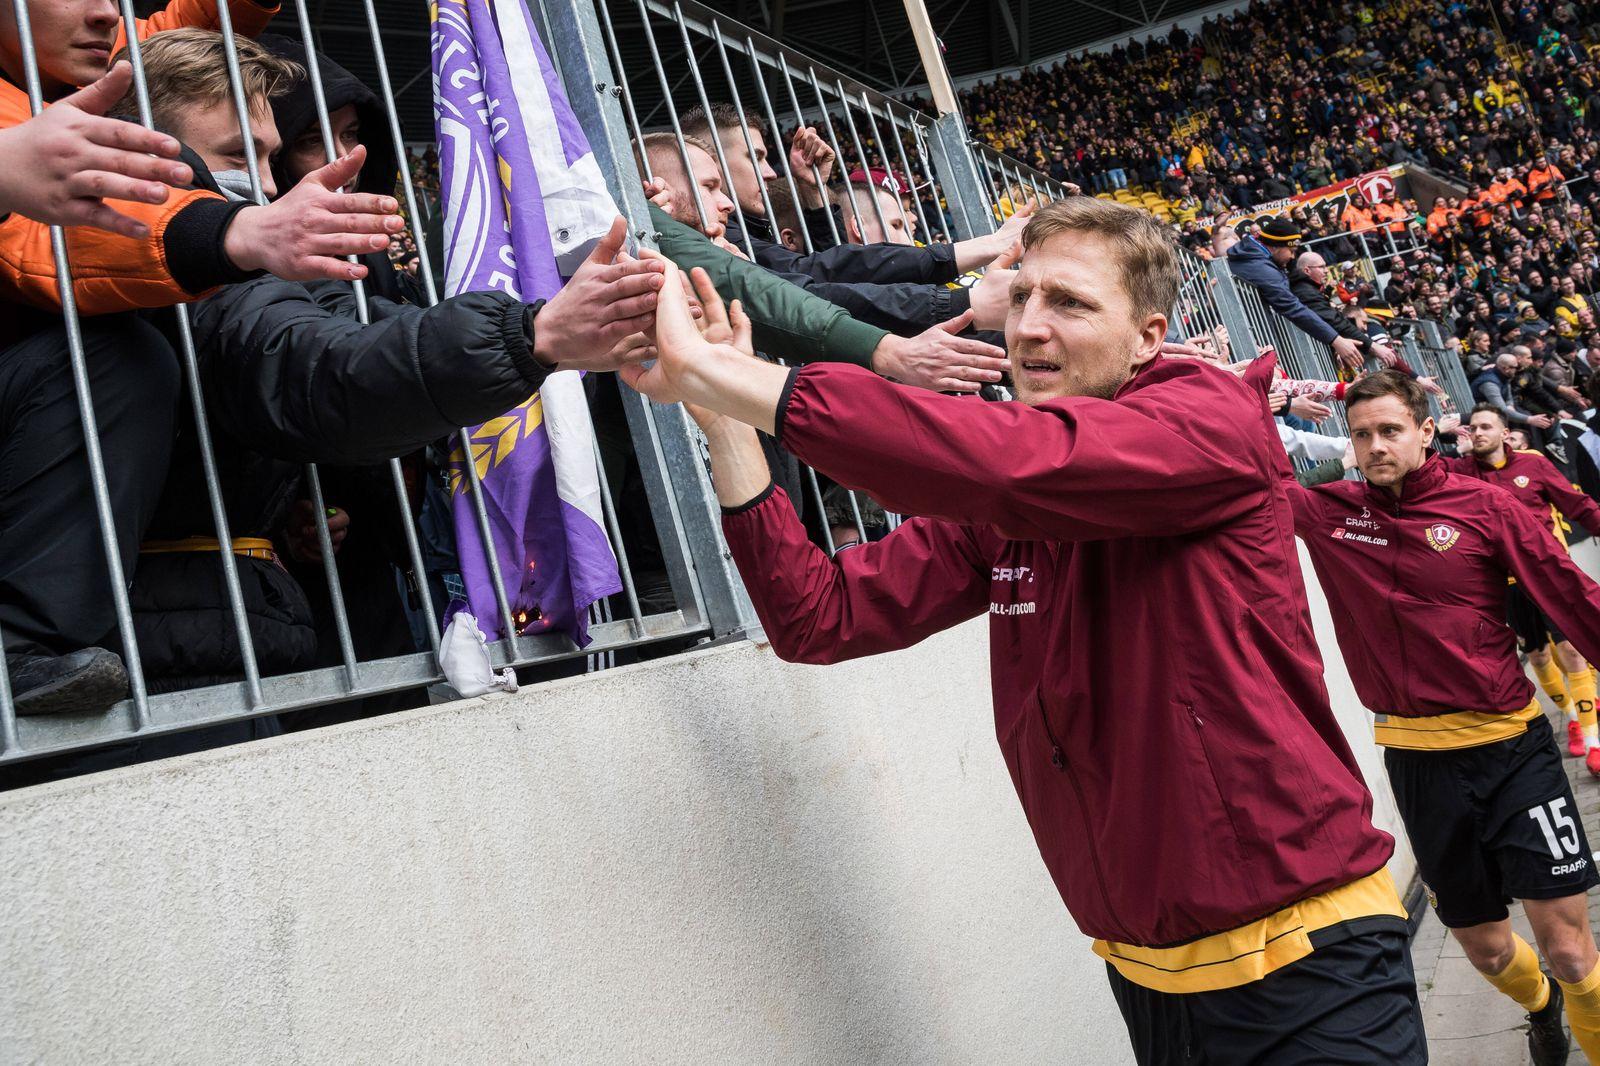 Dresdens Marco Hartmann nach Abpfiff bei den Fans; SG Dynamo Dresden - FC Erzgebirge Aue; Fu?ball; 2. Liga; Saison 2019/